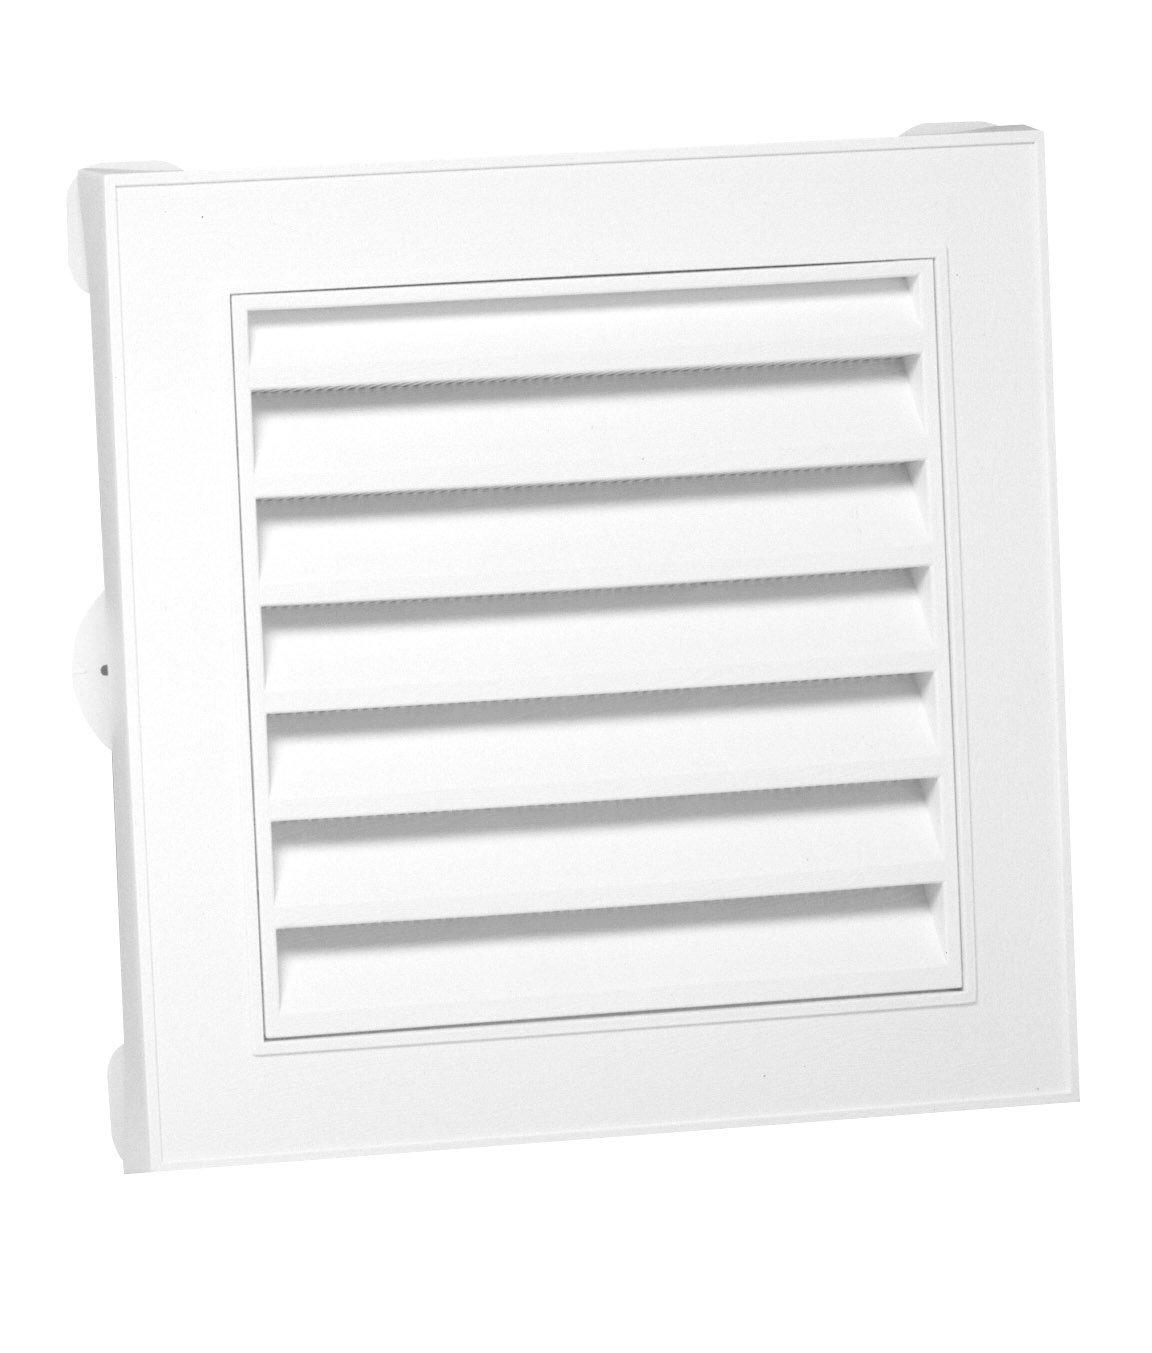 Duraflo 626045-00 18-Inch Square Gable Vent, White